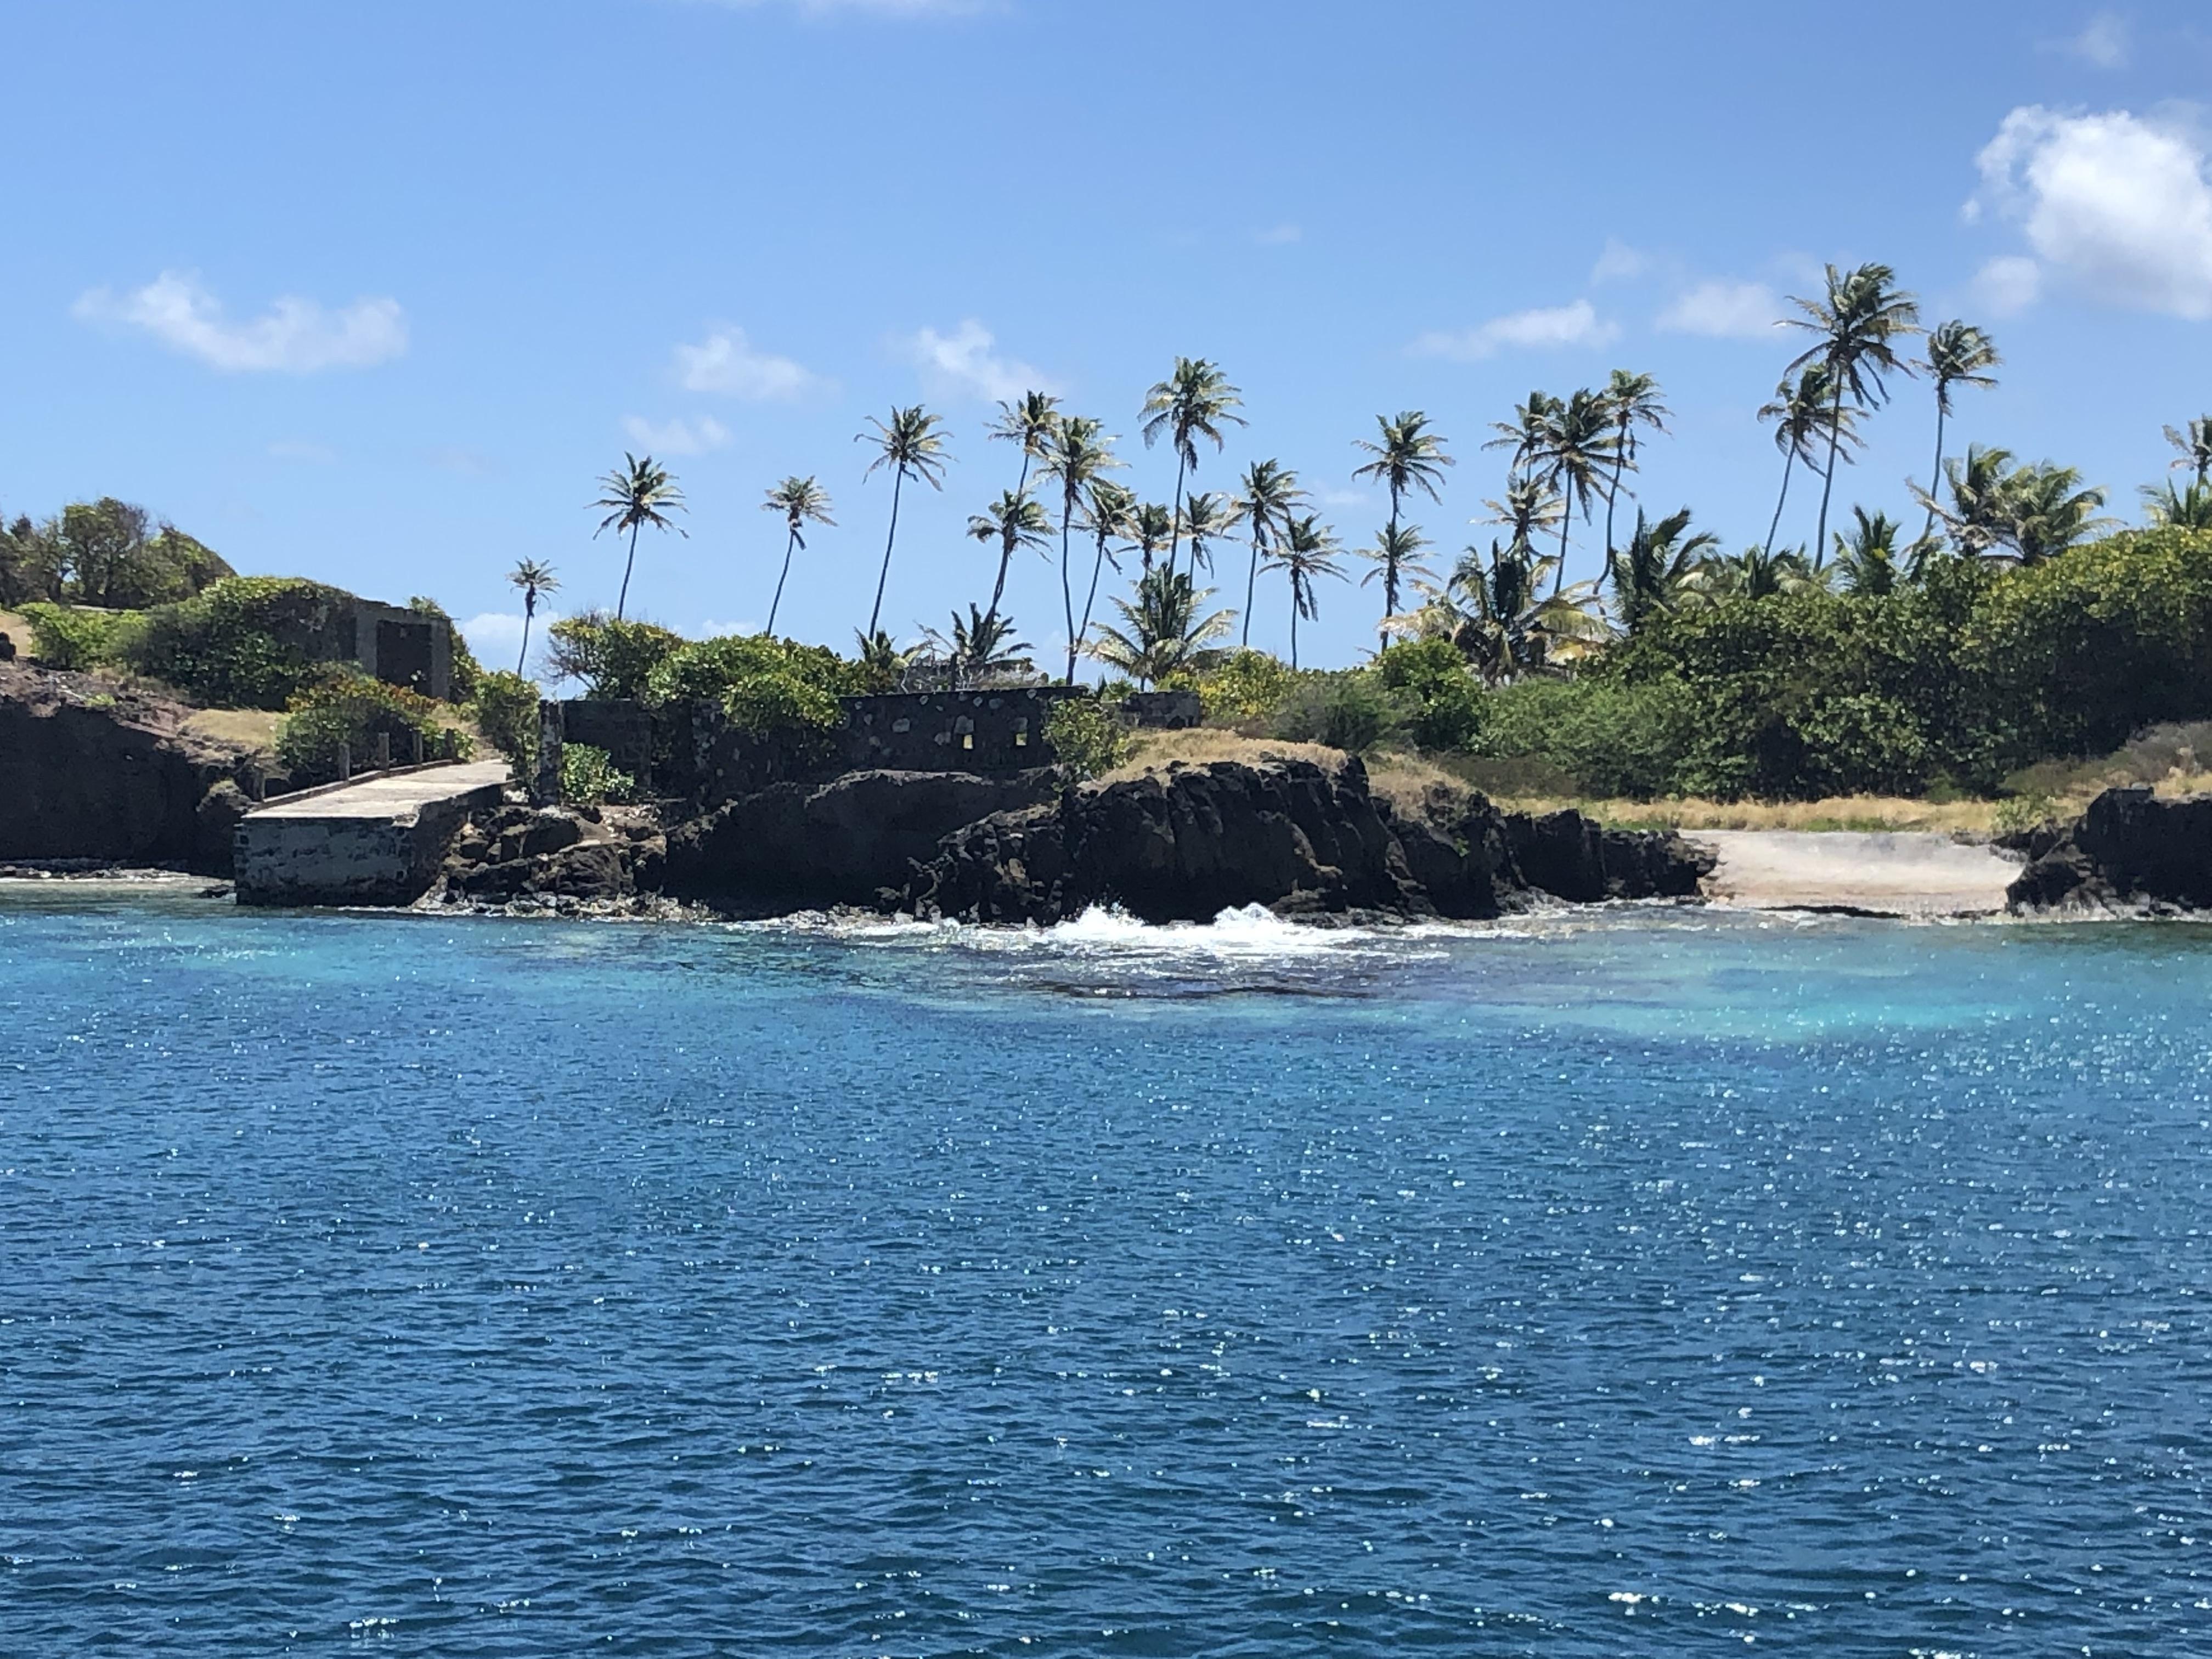 Petit Nevis Whaling Station